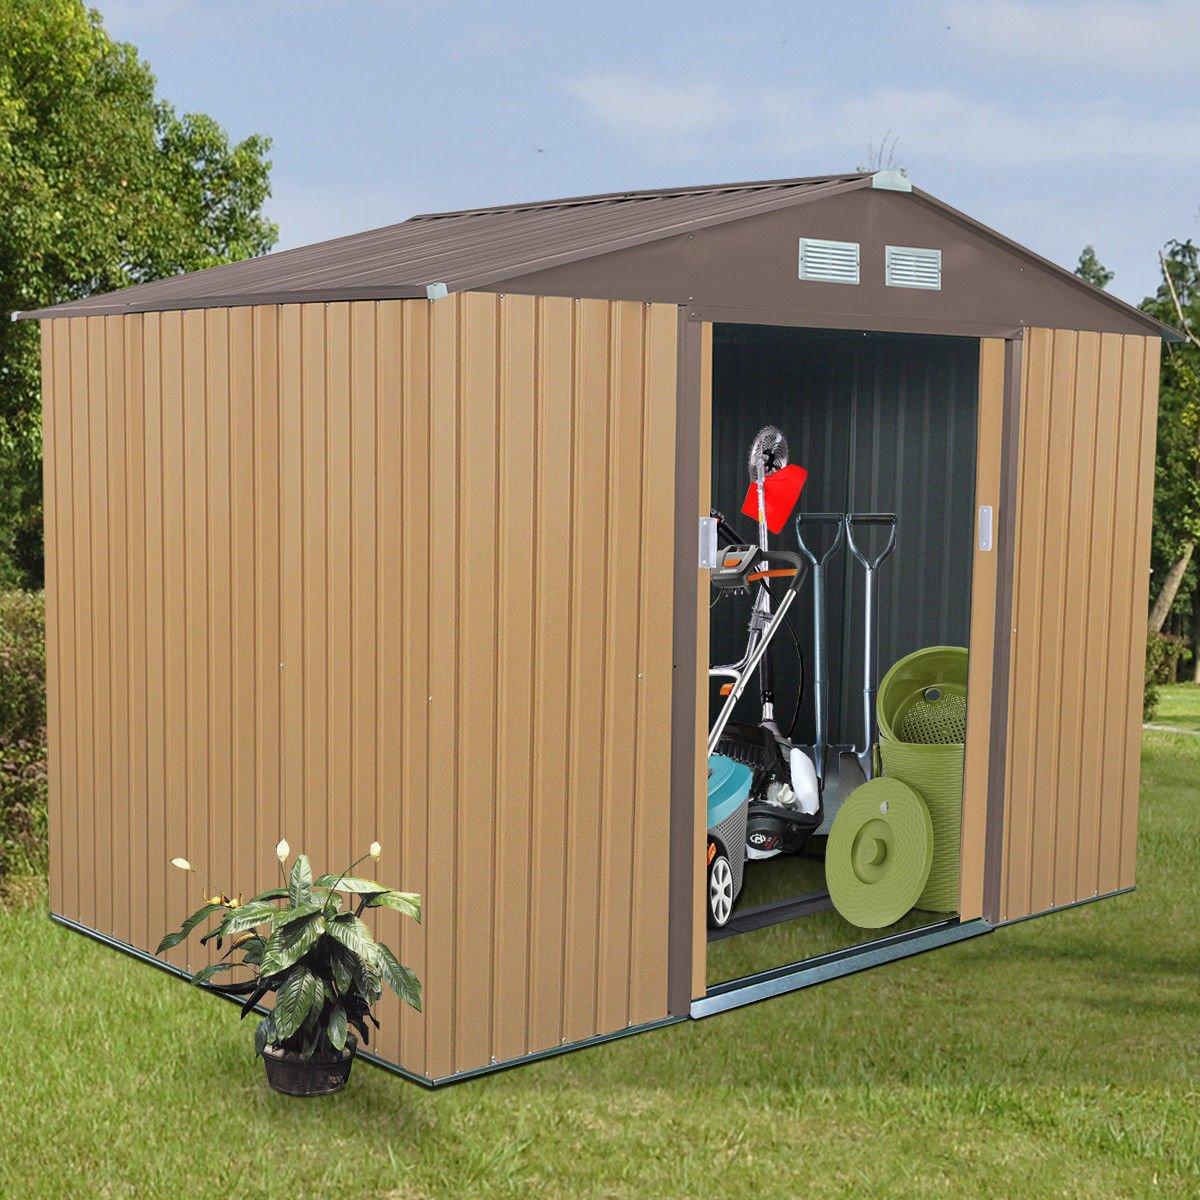 9' X 6' Outdoor Garden Storage Shed Tool House Sliding Door Steel Khaki New by tamsun (Image #1)